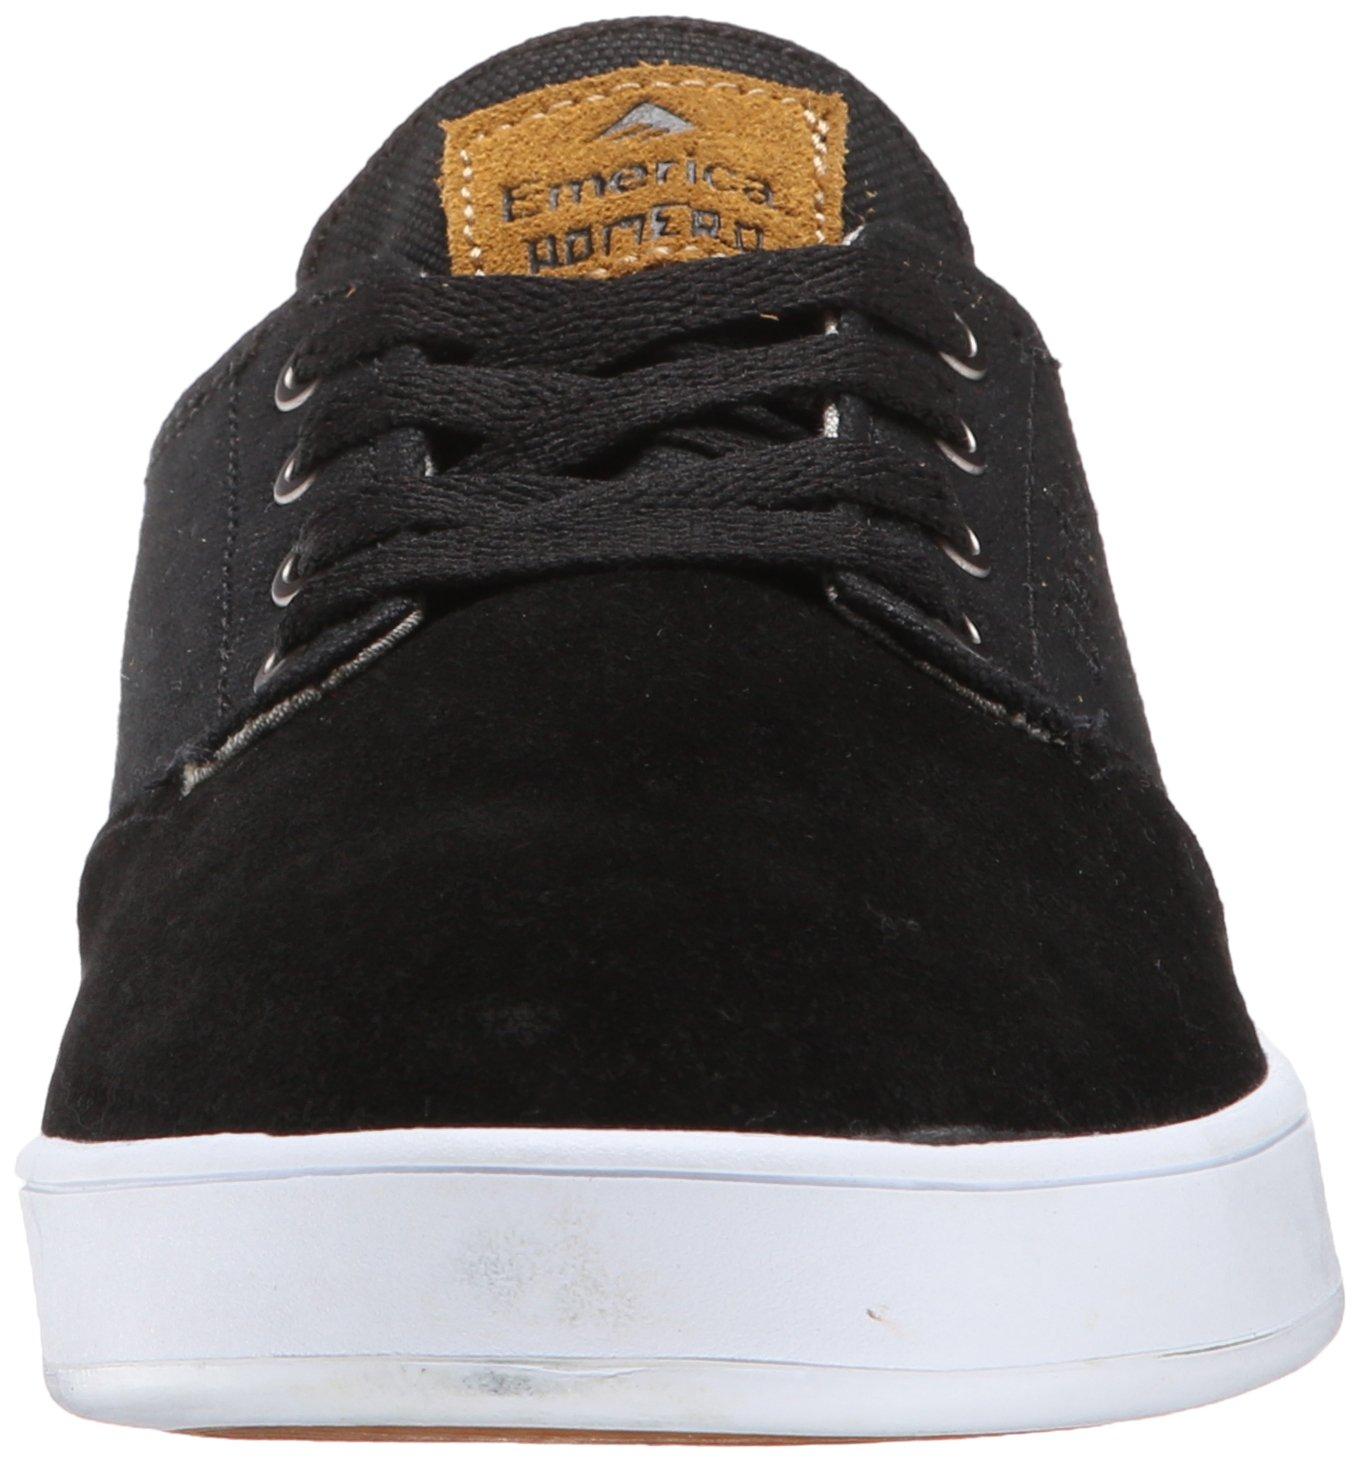 separation shoes 5494b 1a69e Emerica Laced B073Q2HTLM Laced by - Leo Romero - Zapatillas de  Skateboarding de ante hombre NegroMarrón fda7428 - alemdavoz.online